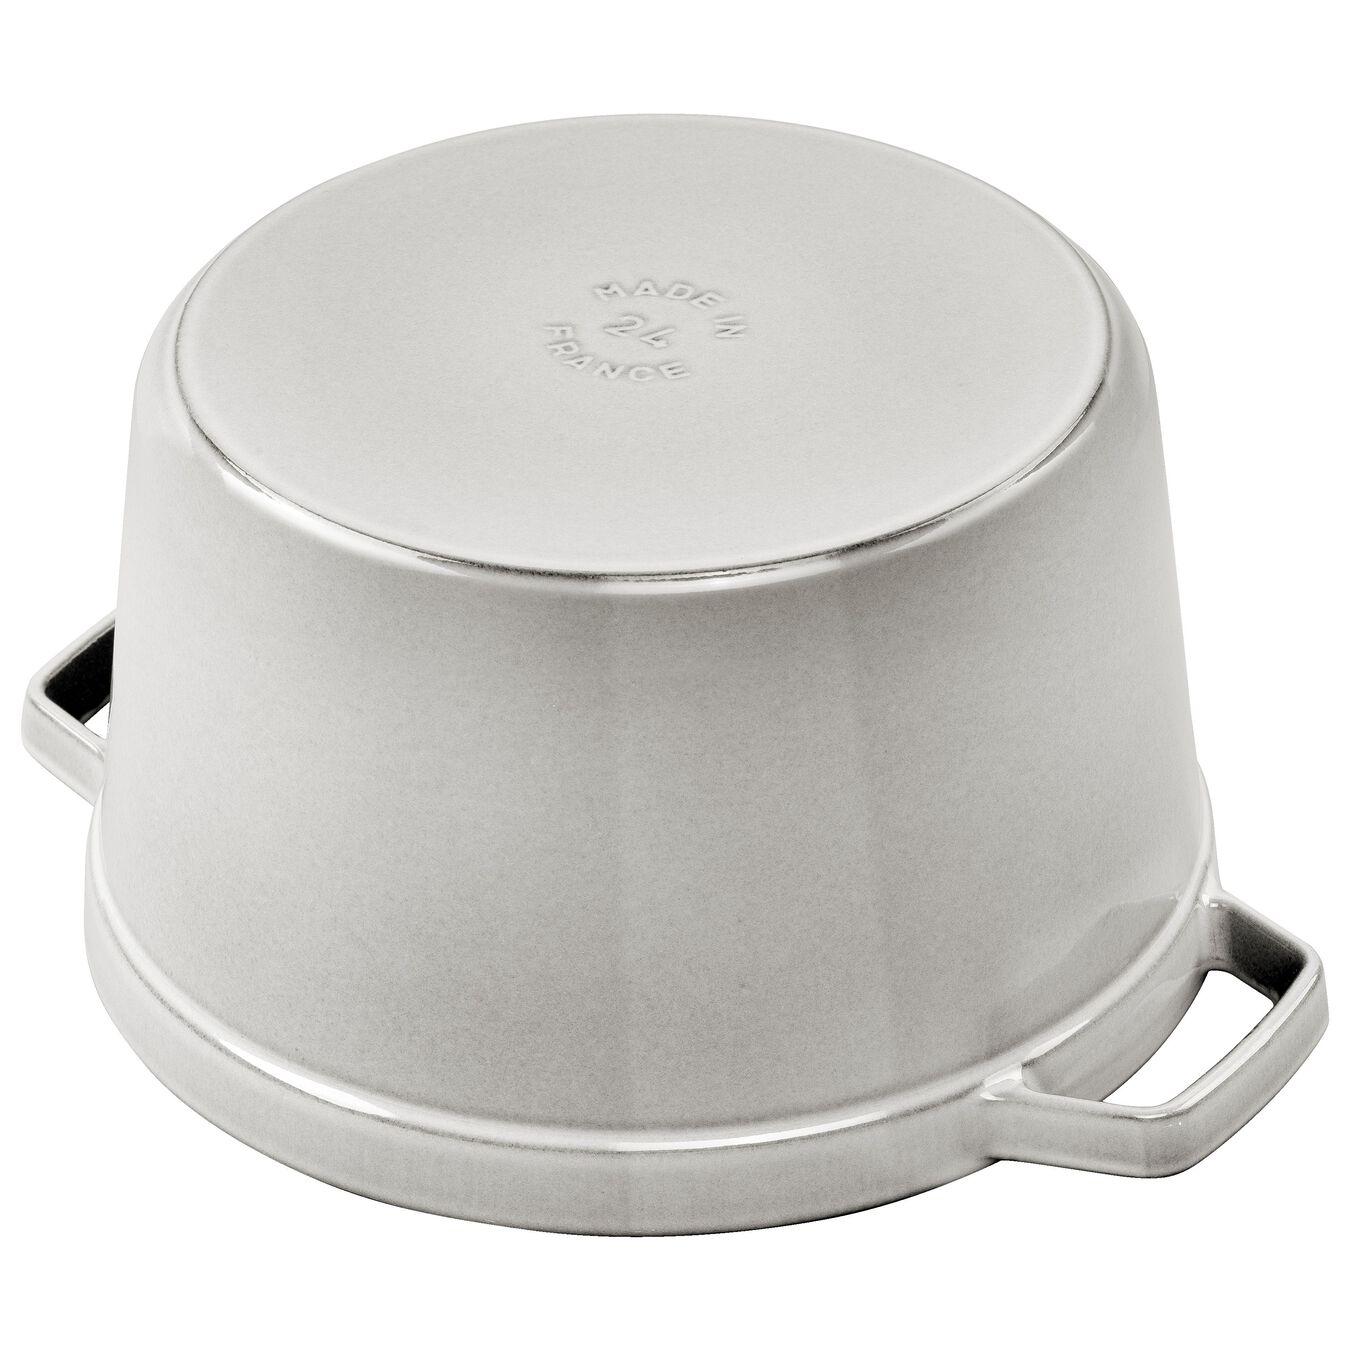 4,75 l Cast iron round Faitout, White Truffle,,large 2